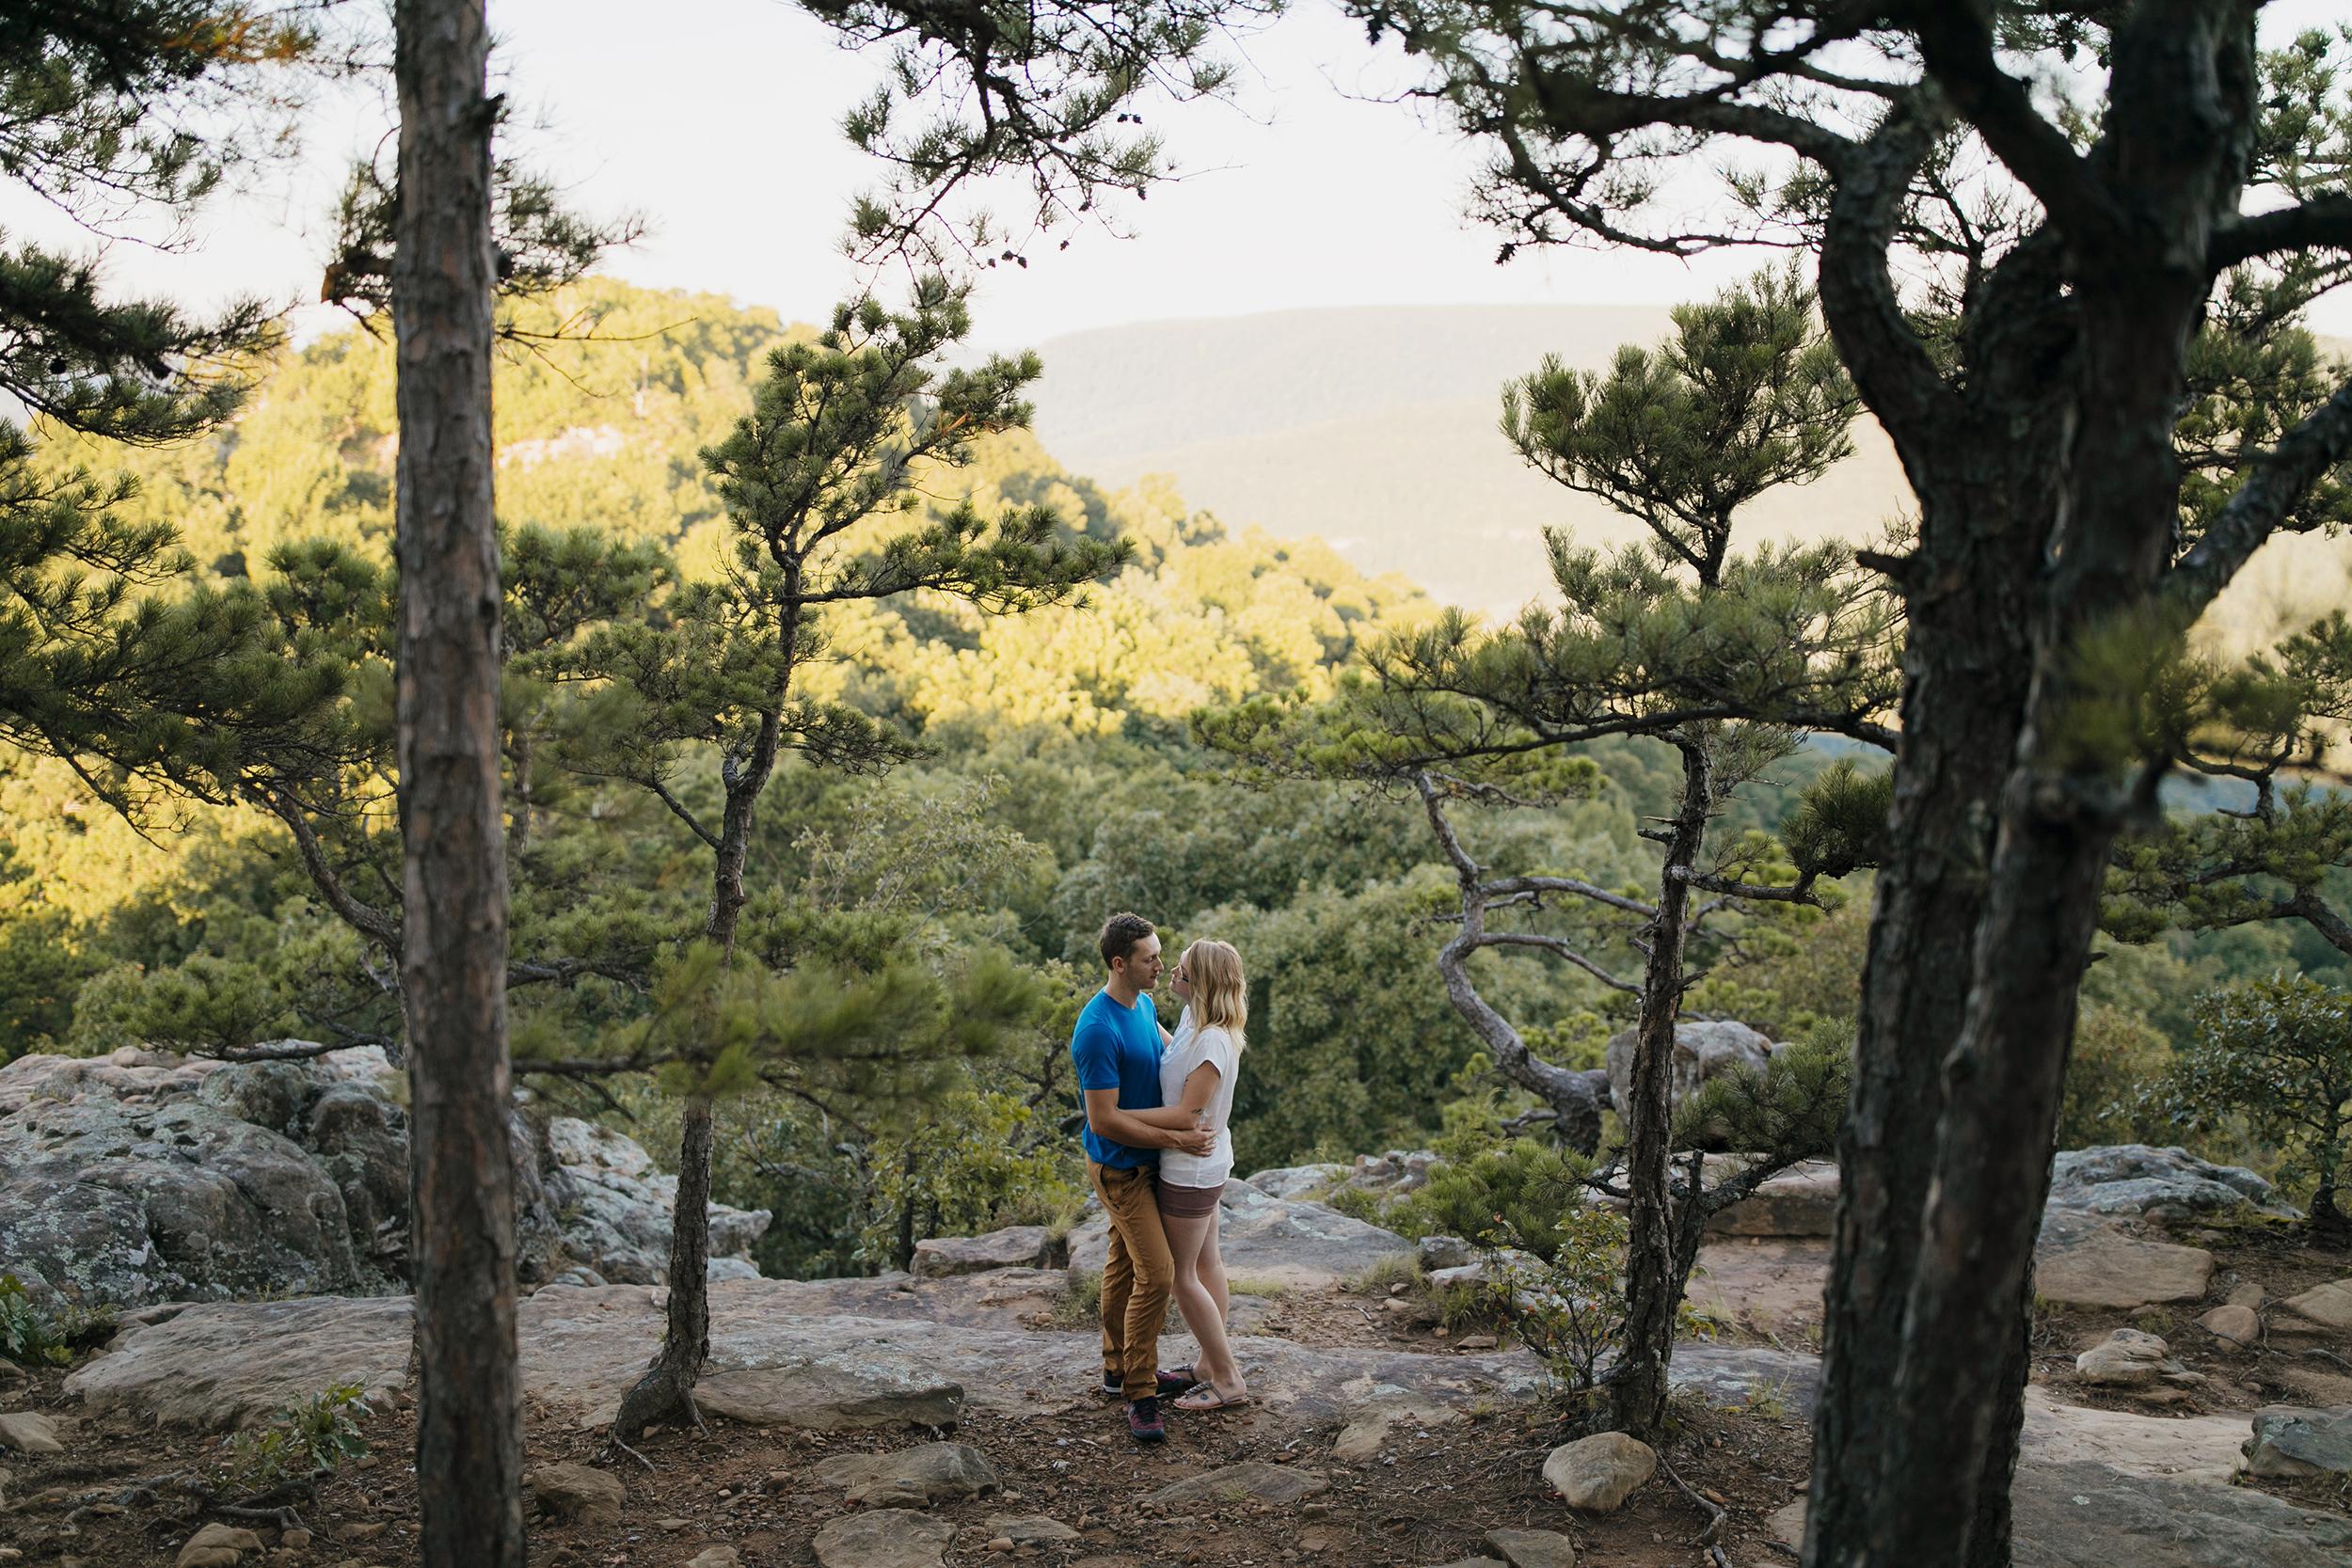 Buffalo-River-Arkansas-Sams-Throne-Adventure-Engagement-Photographer57.JPG